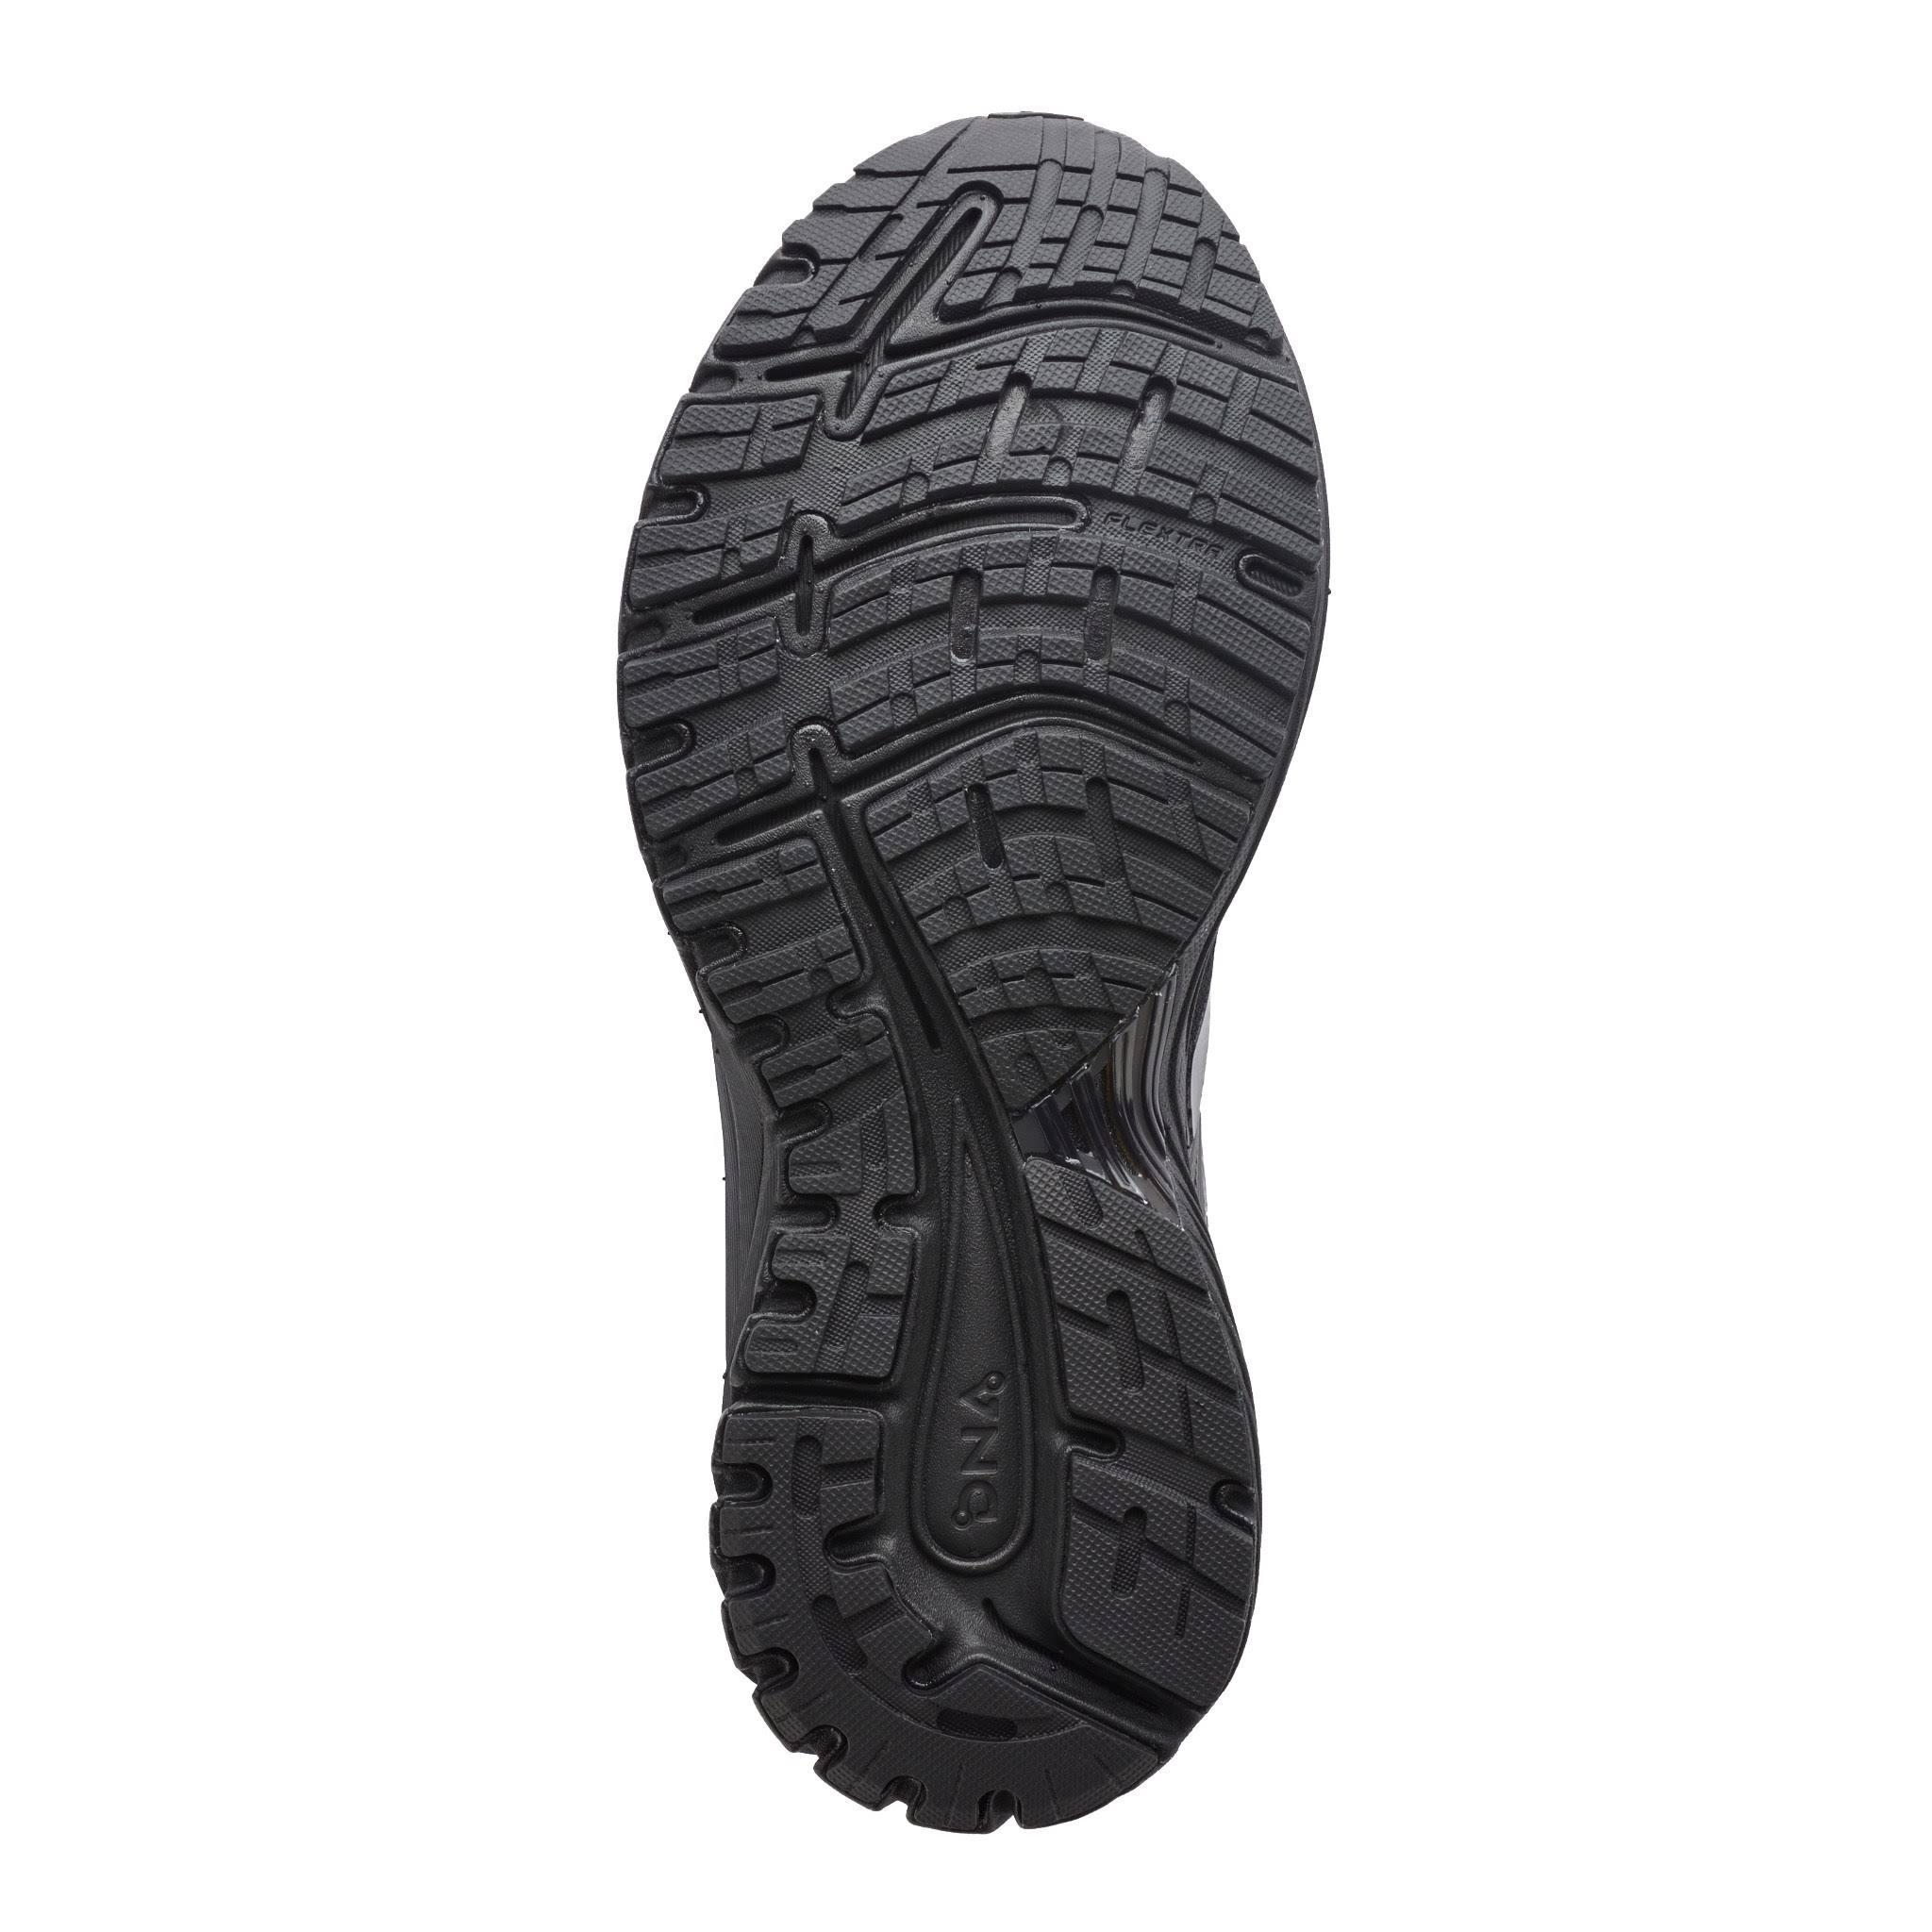 Gts Zapatillas Mujer 1b Brooks 120268 Running 026 De Para 18 Adrenaline tqxWwUFWO5